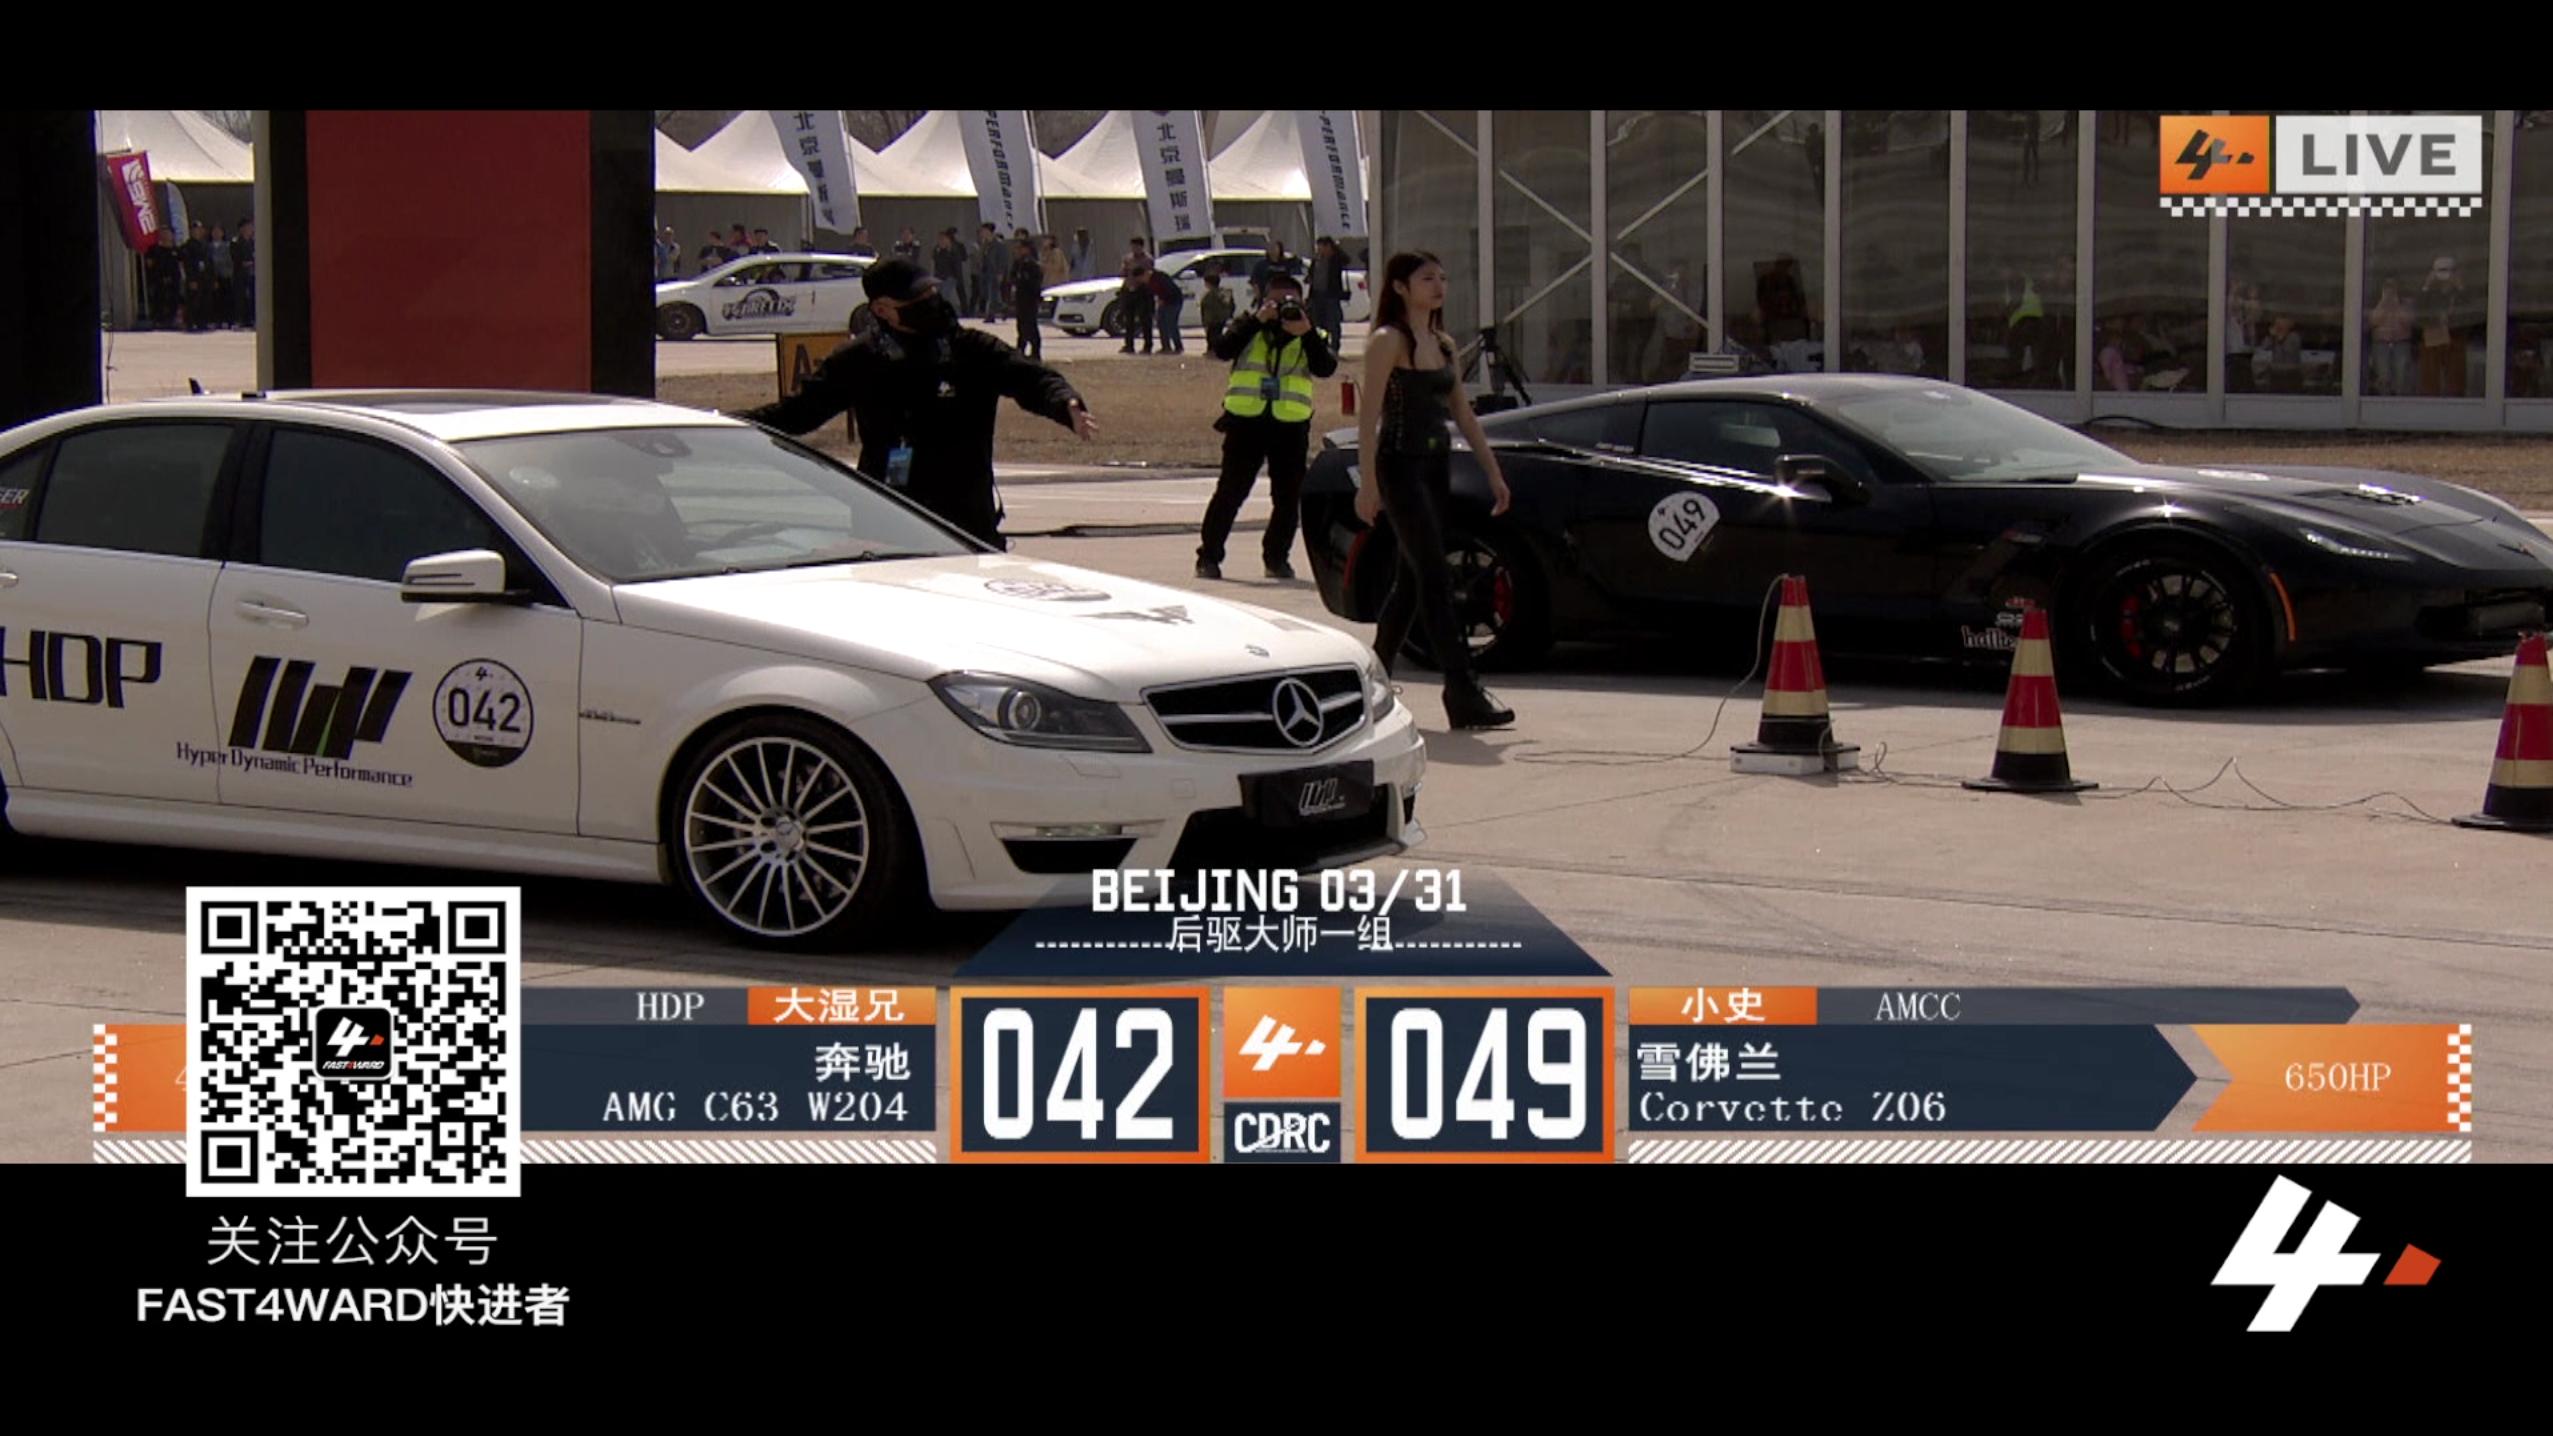 FAST4WARD  北京站 奔驰amgVS雪弗兰corvette z06